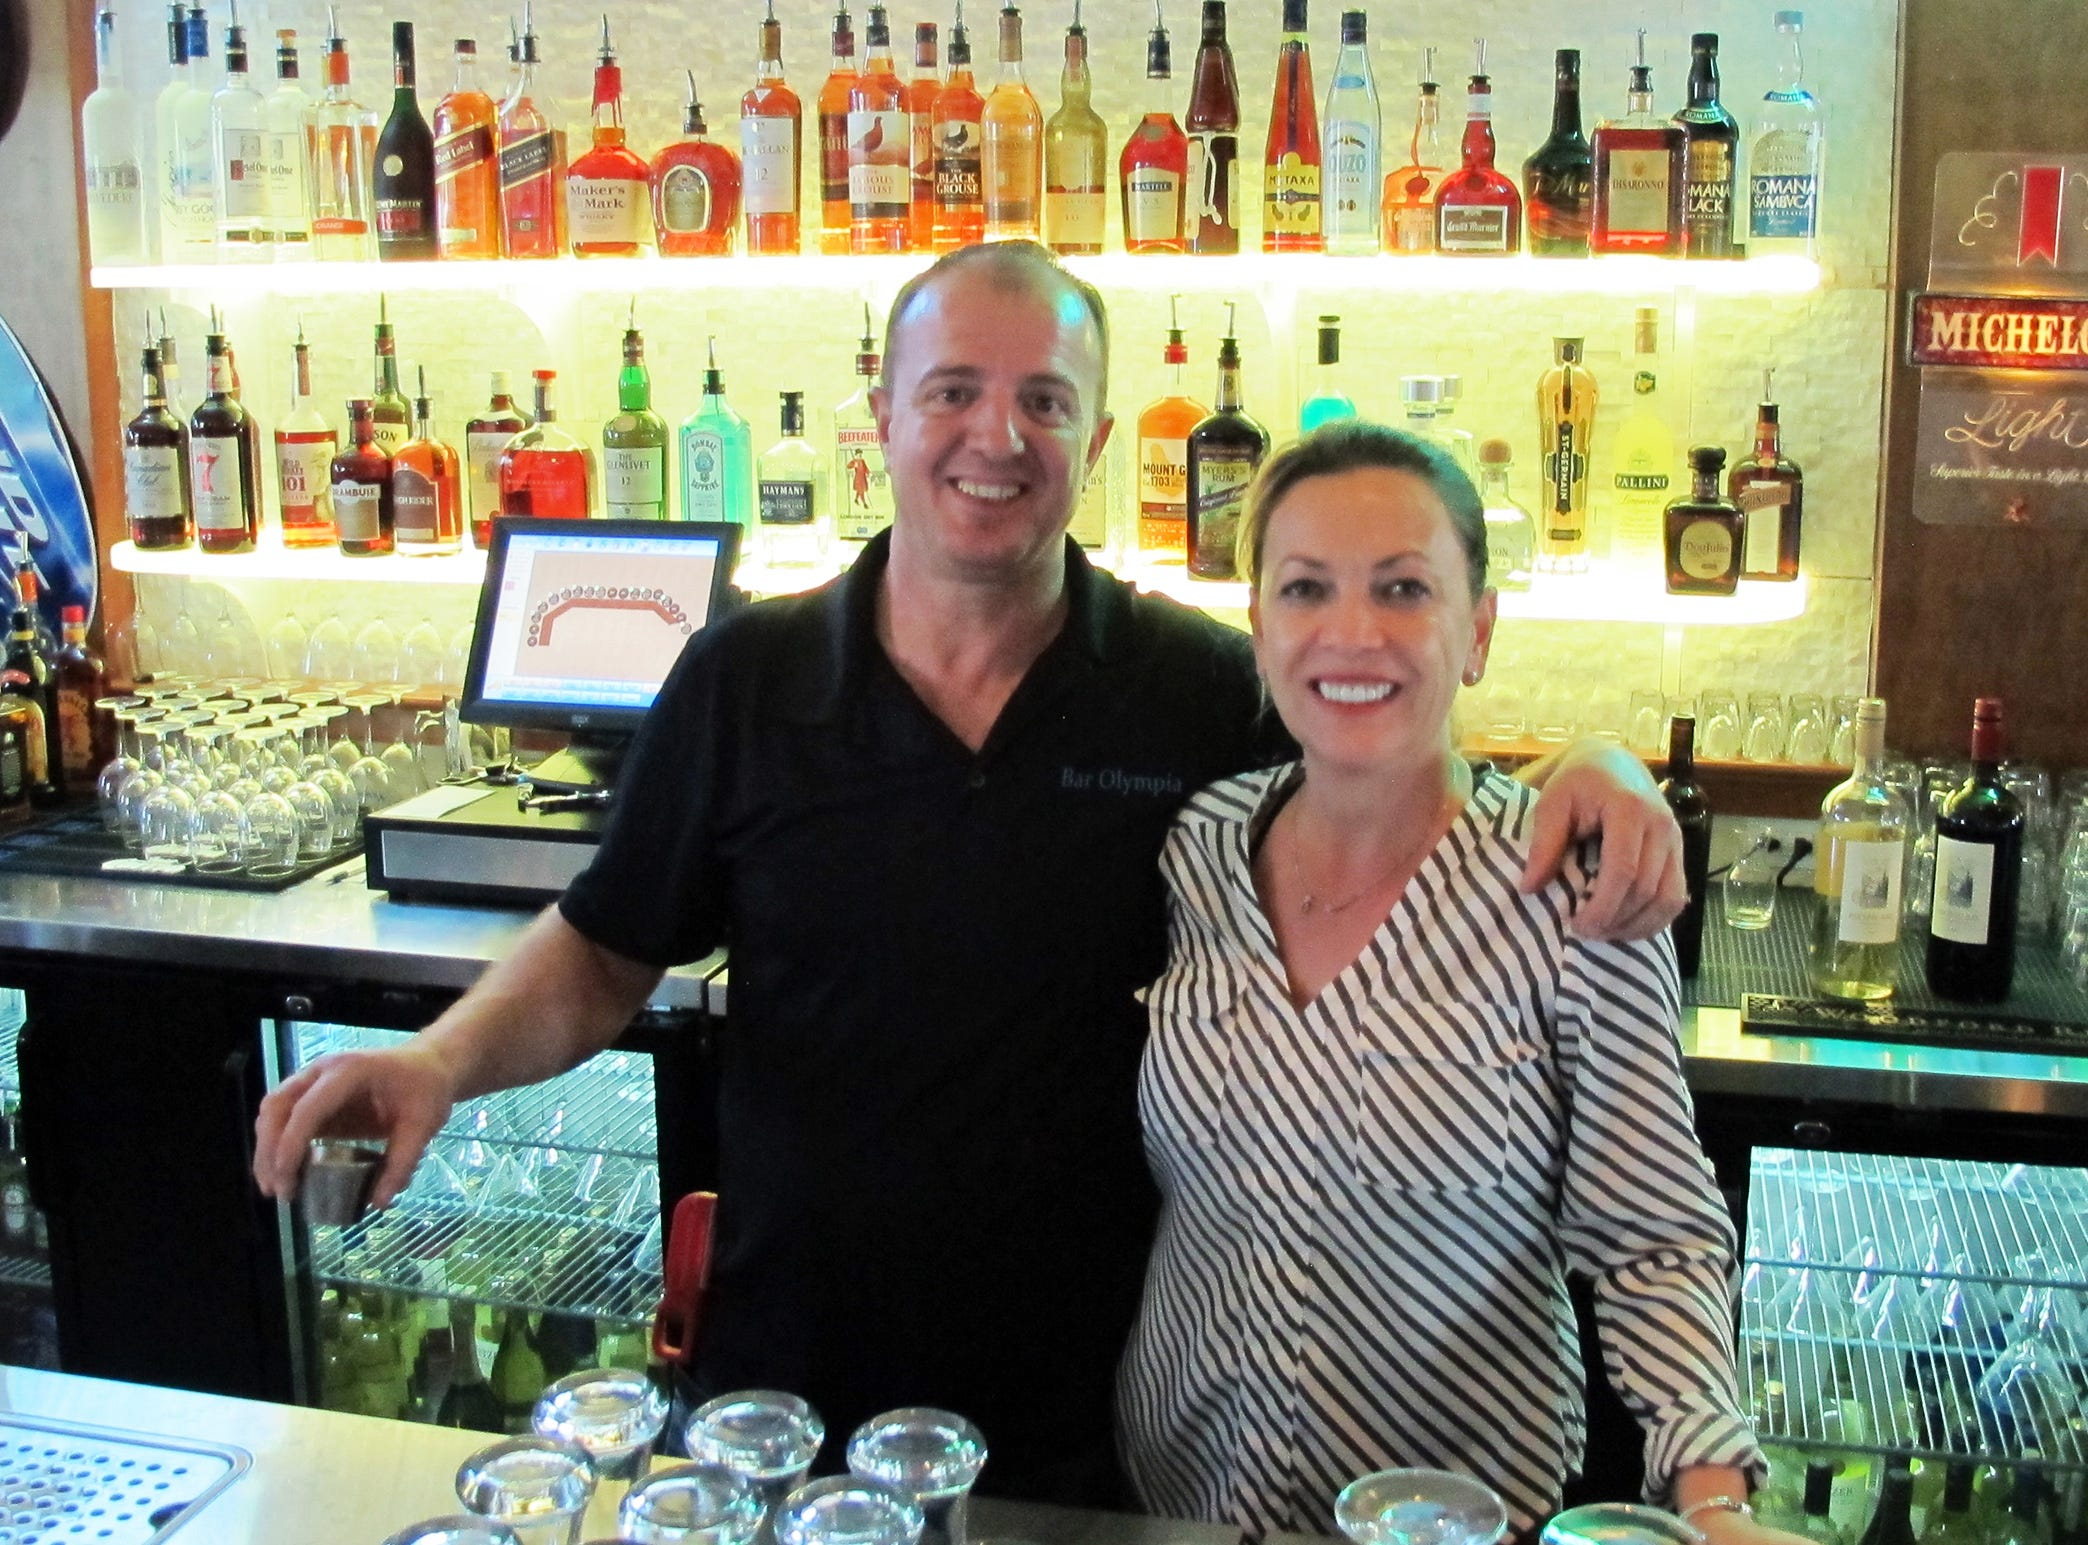 Tony and Enka Bekurti launched their latest restaurant, VillageWalk Bar & Grill, in March 2018 in VillageWalk of Bonita Springs.